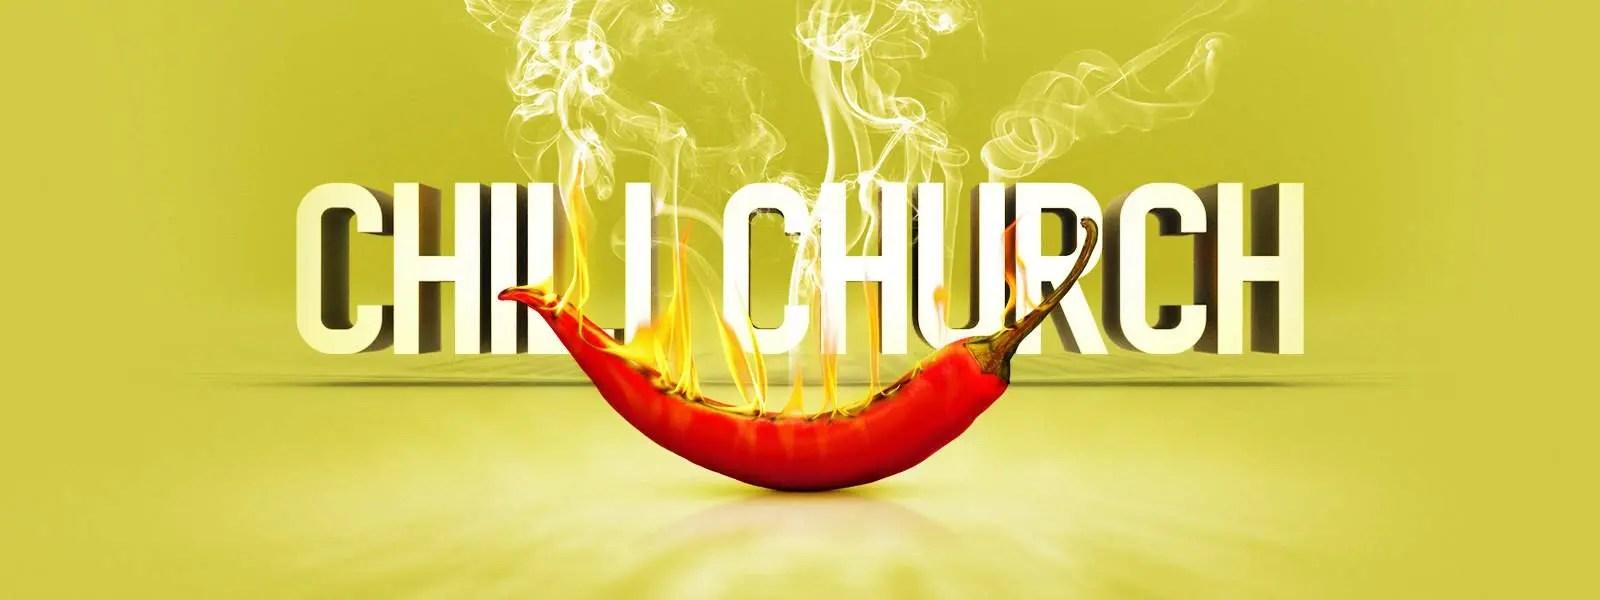 Chili Church 2016